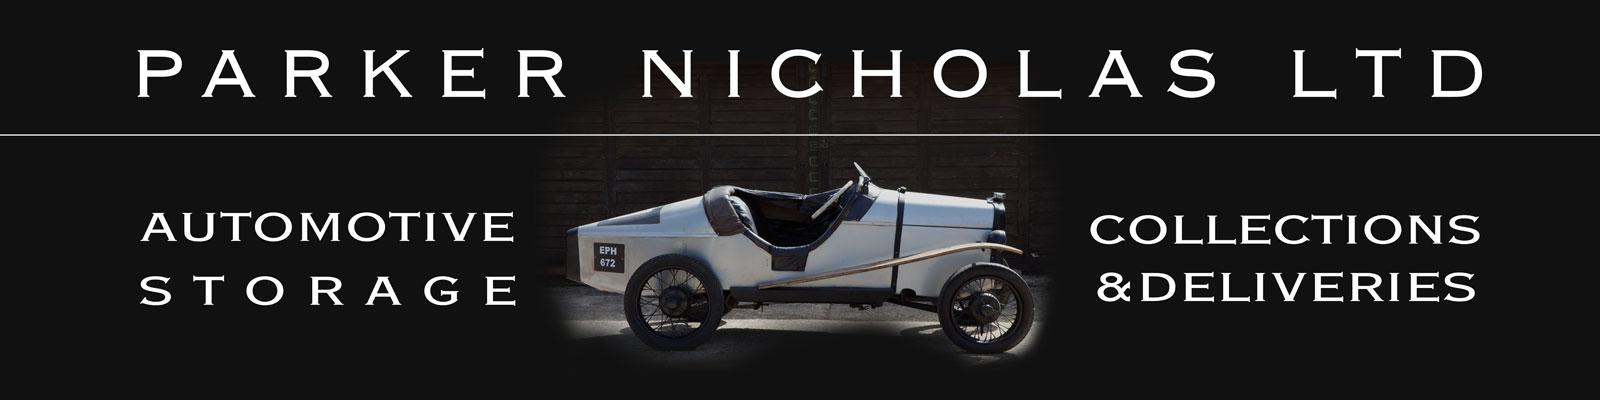 Parker Nicholas Ltd –